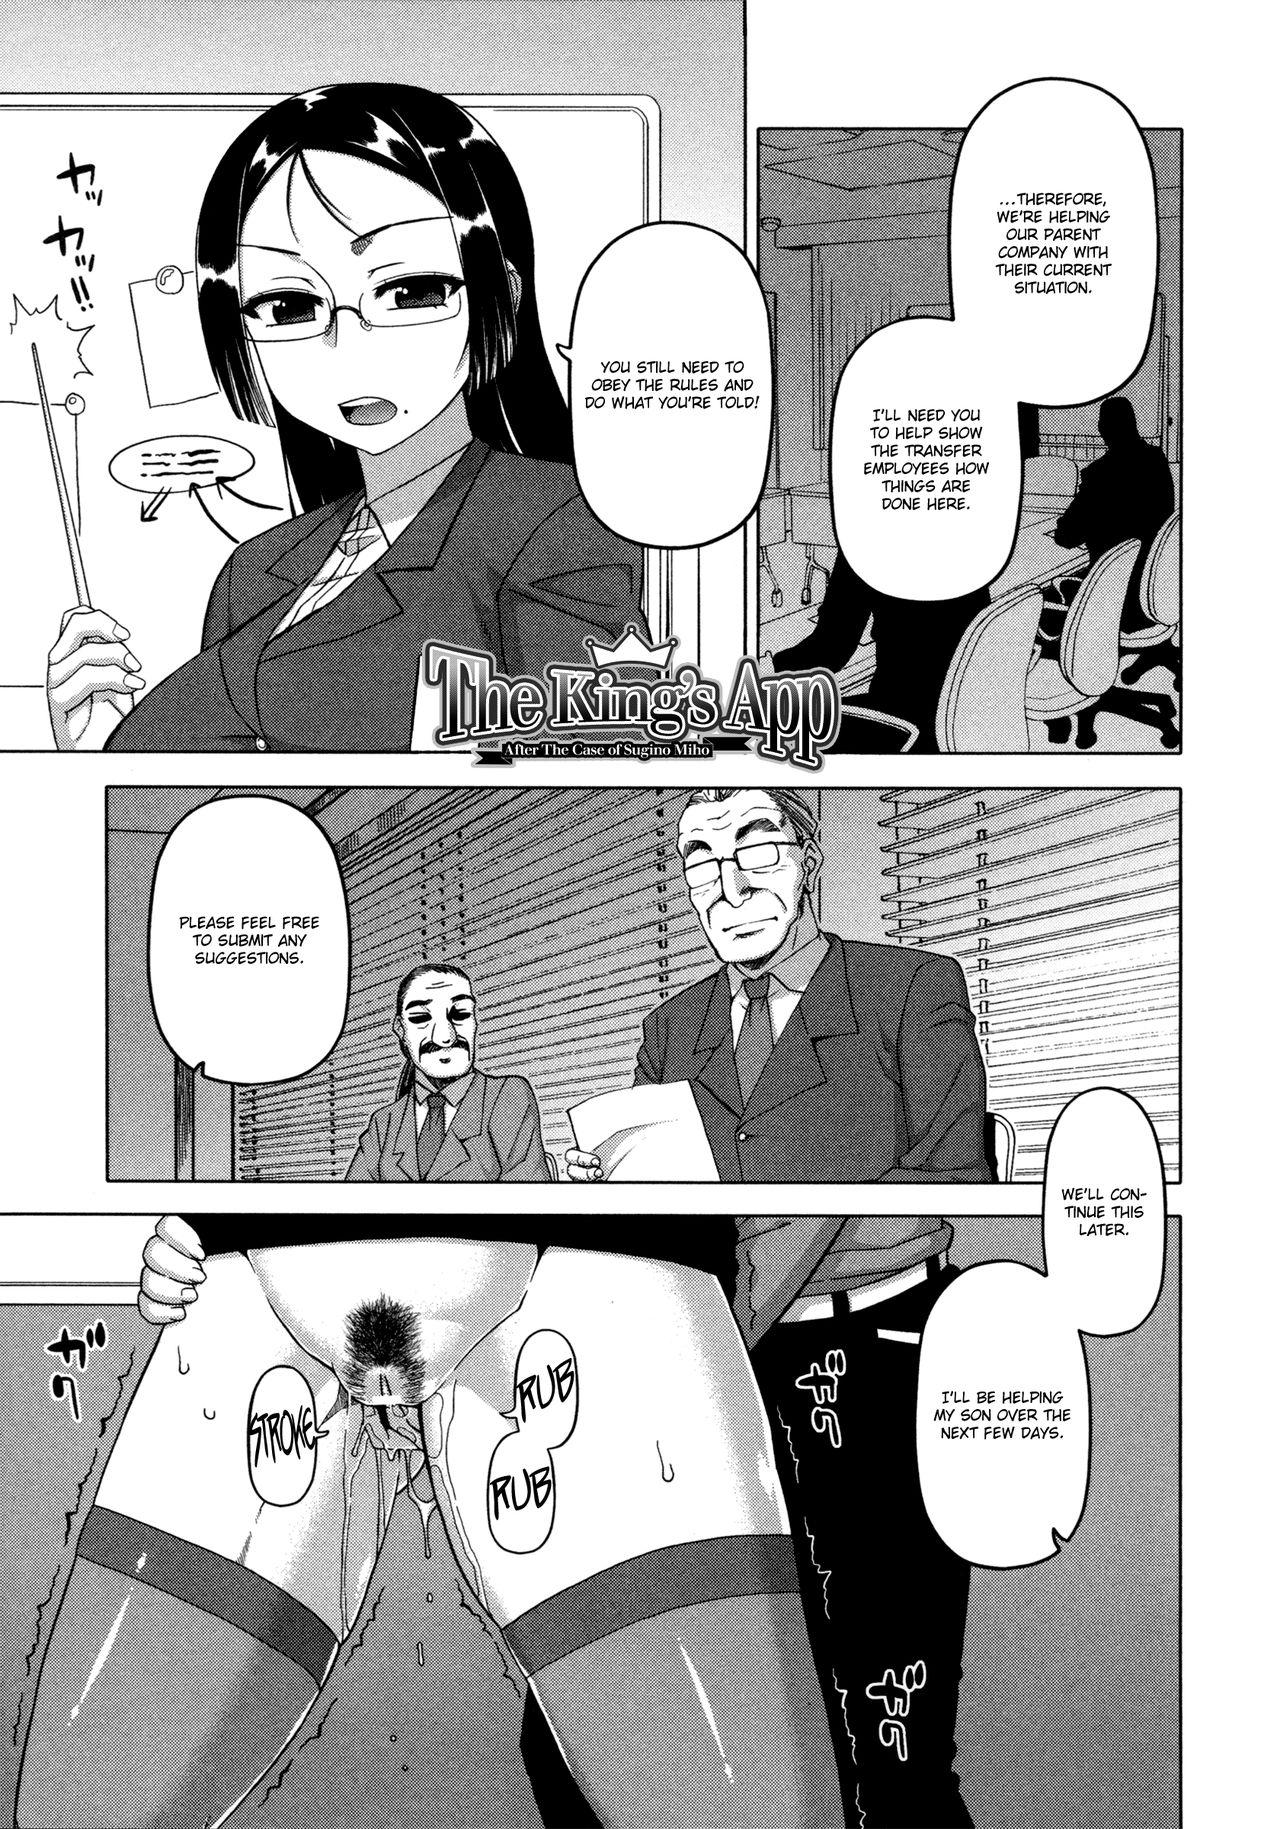 [Takatsu] Ou-sama Appli - King App [English] [TheRobotsGhost] 34